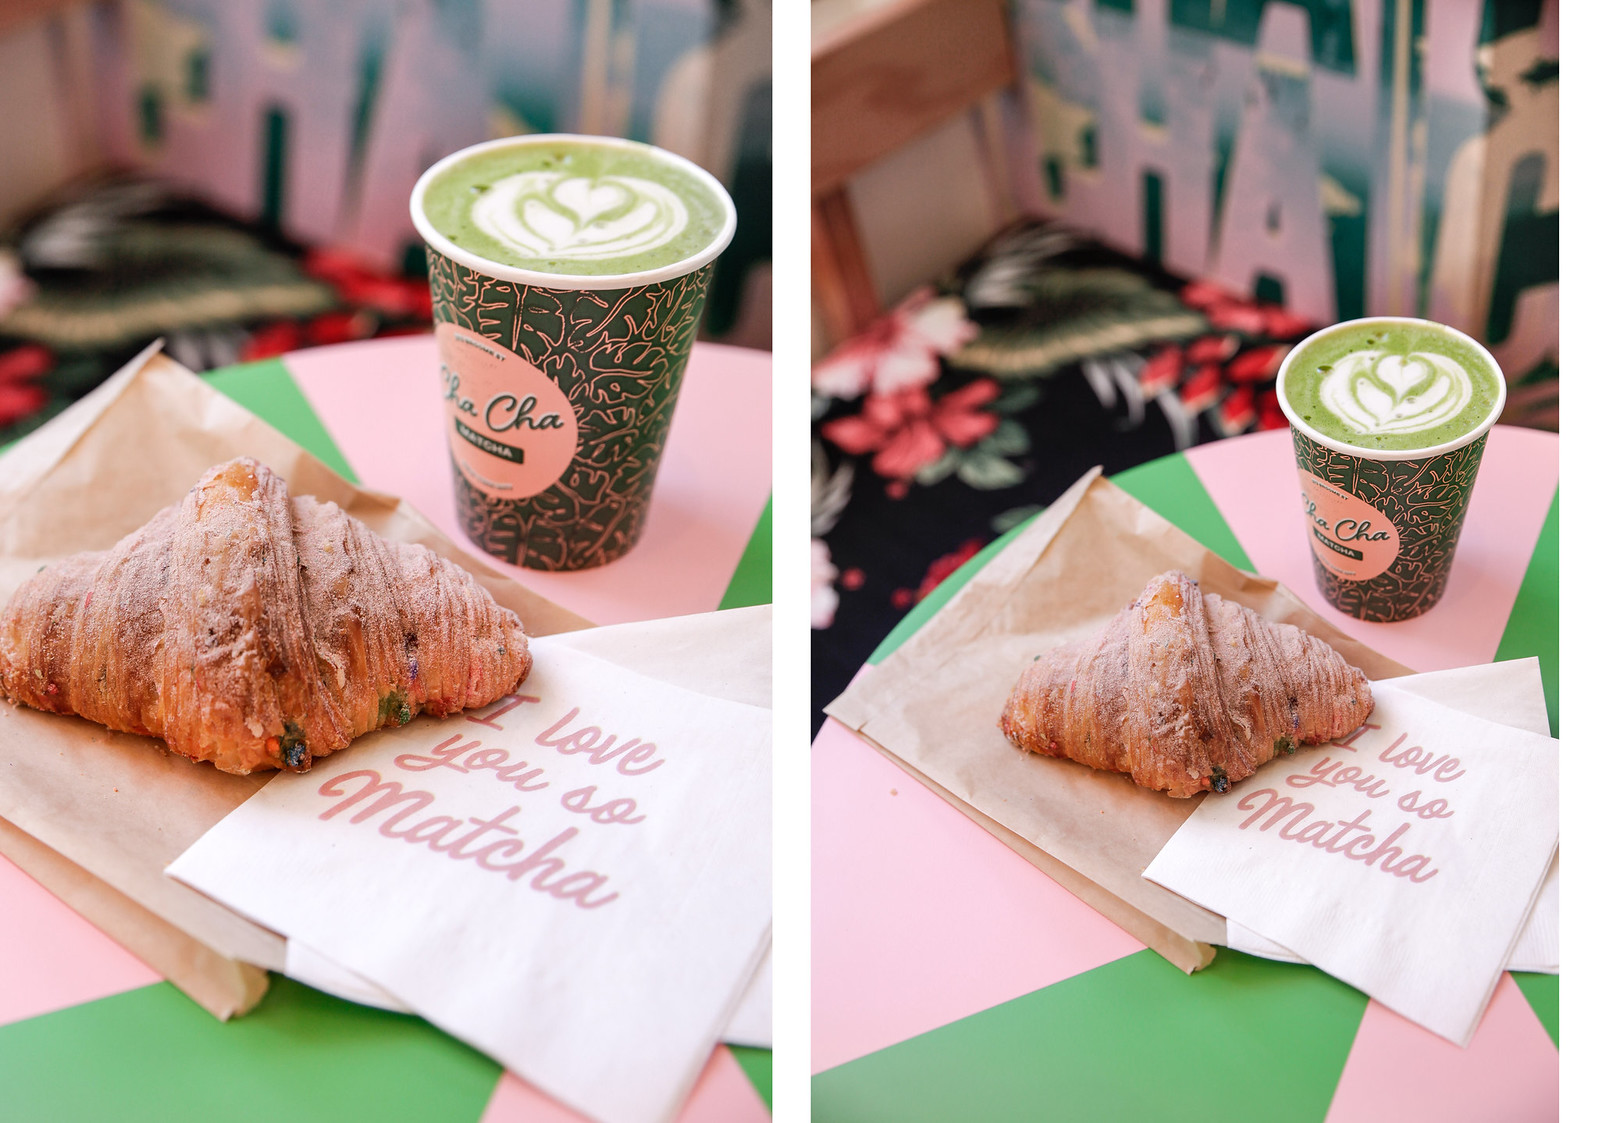 02_cha_cha_matcha_cafeteria_rosa_nueva_york_el_mejor_matcha_unicorn_croissant_breakfast_theguestgirl_nyc